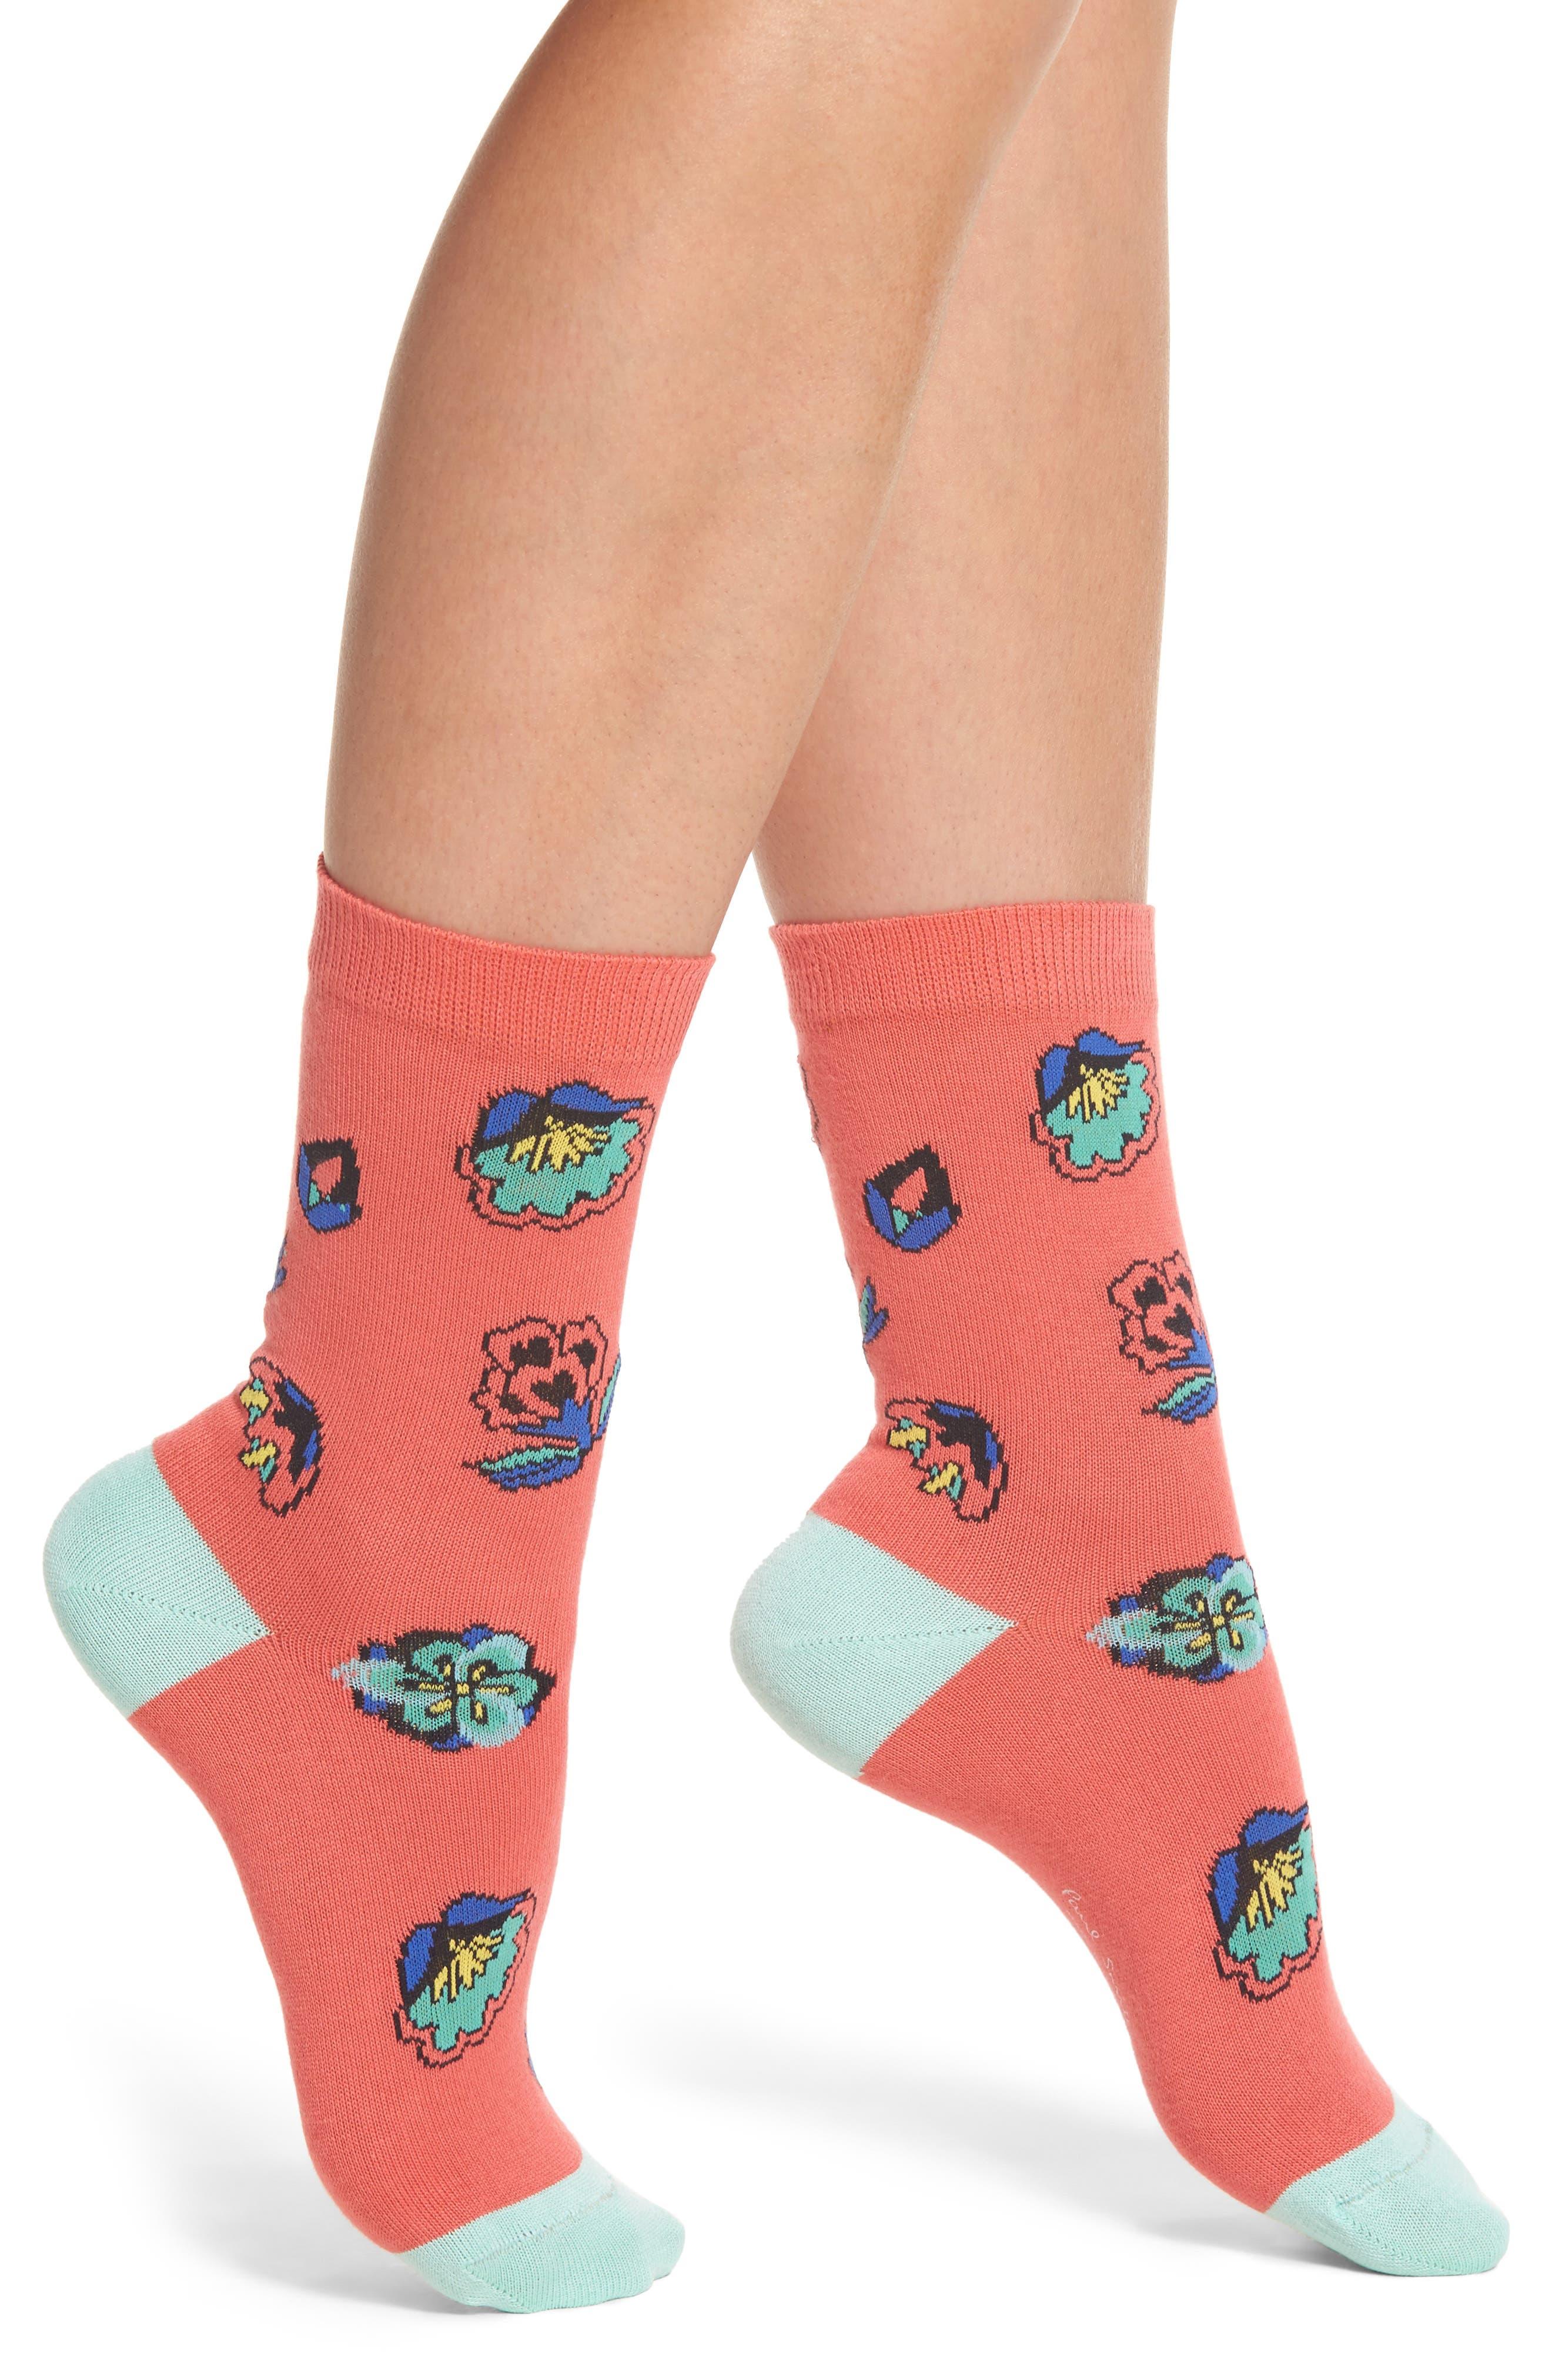 Eloise Kyoto Crew Socks,                         Main,                         color, Coral